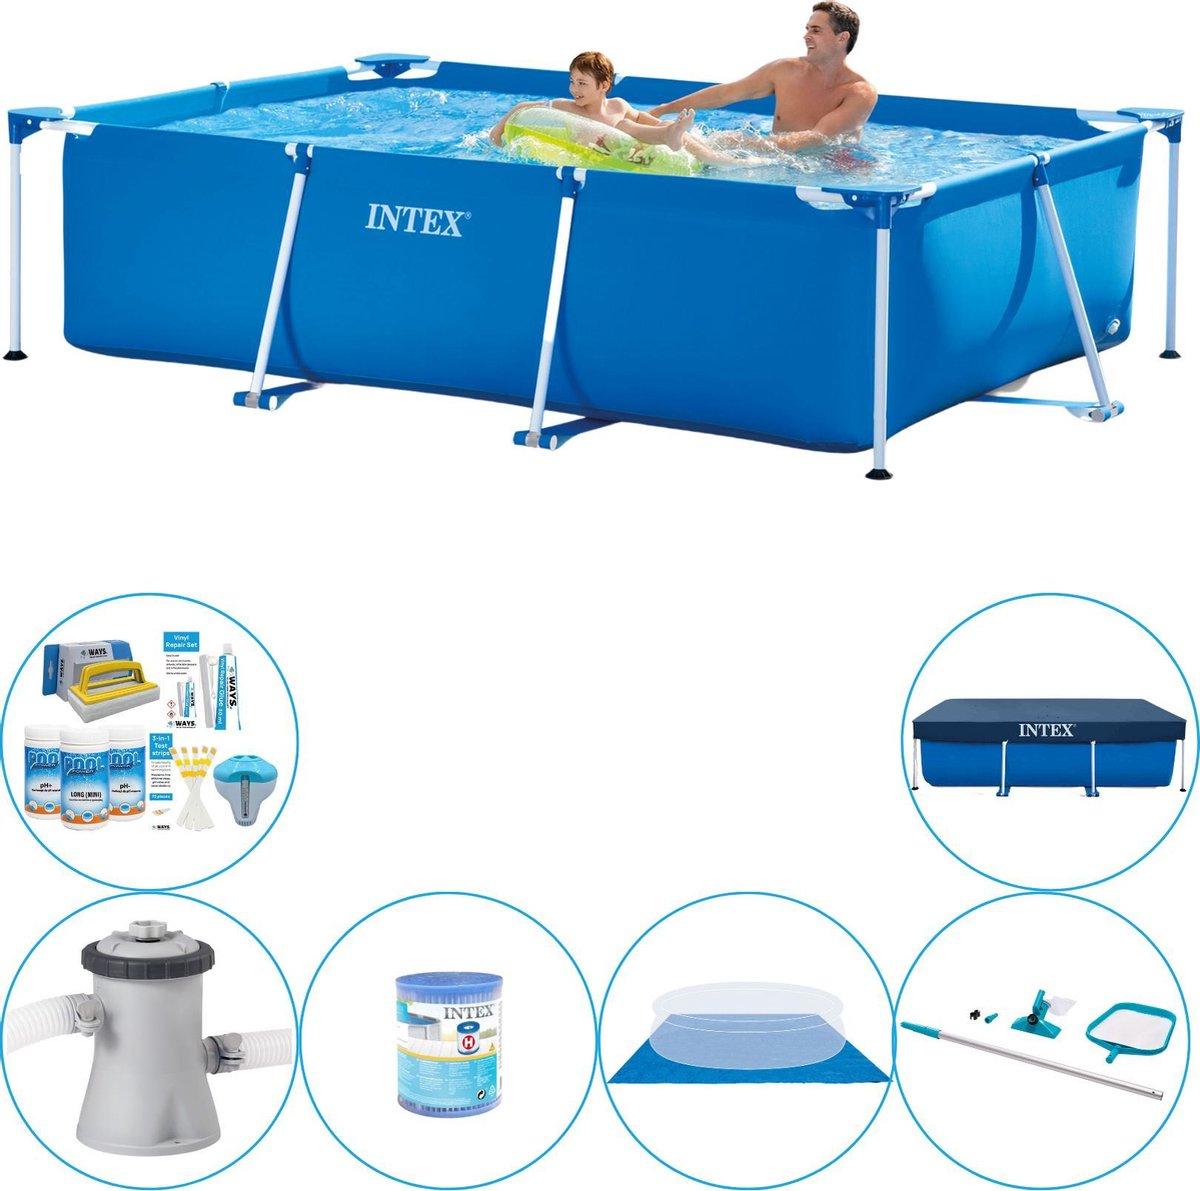 Intex Frame Pool Zwembad - 260 x 160 x 65 cm - Inclusief Accessoires